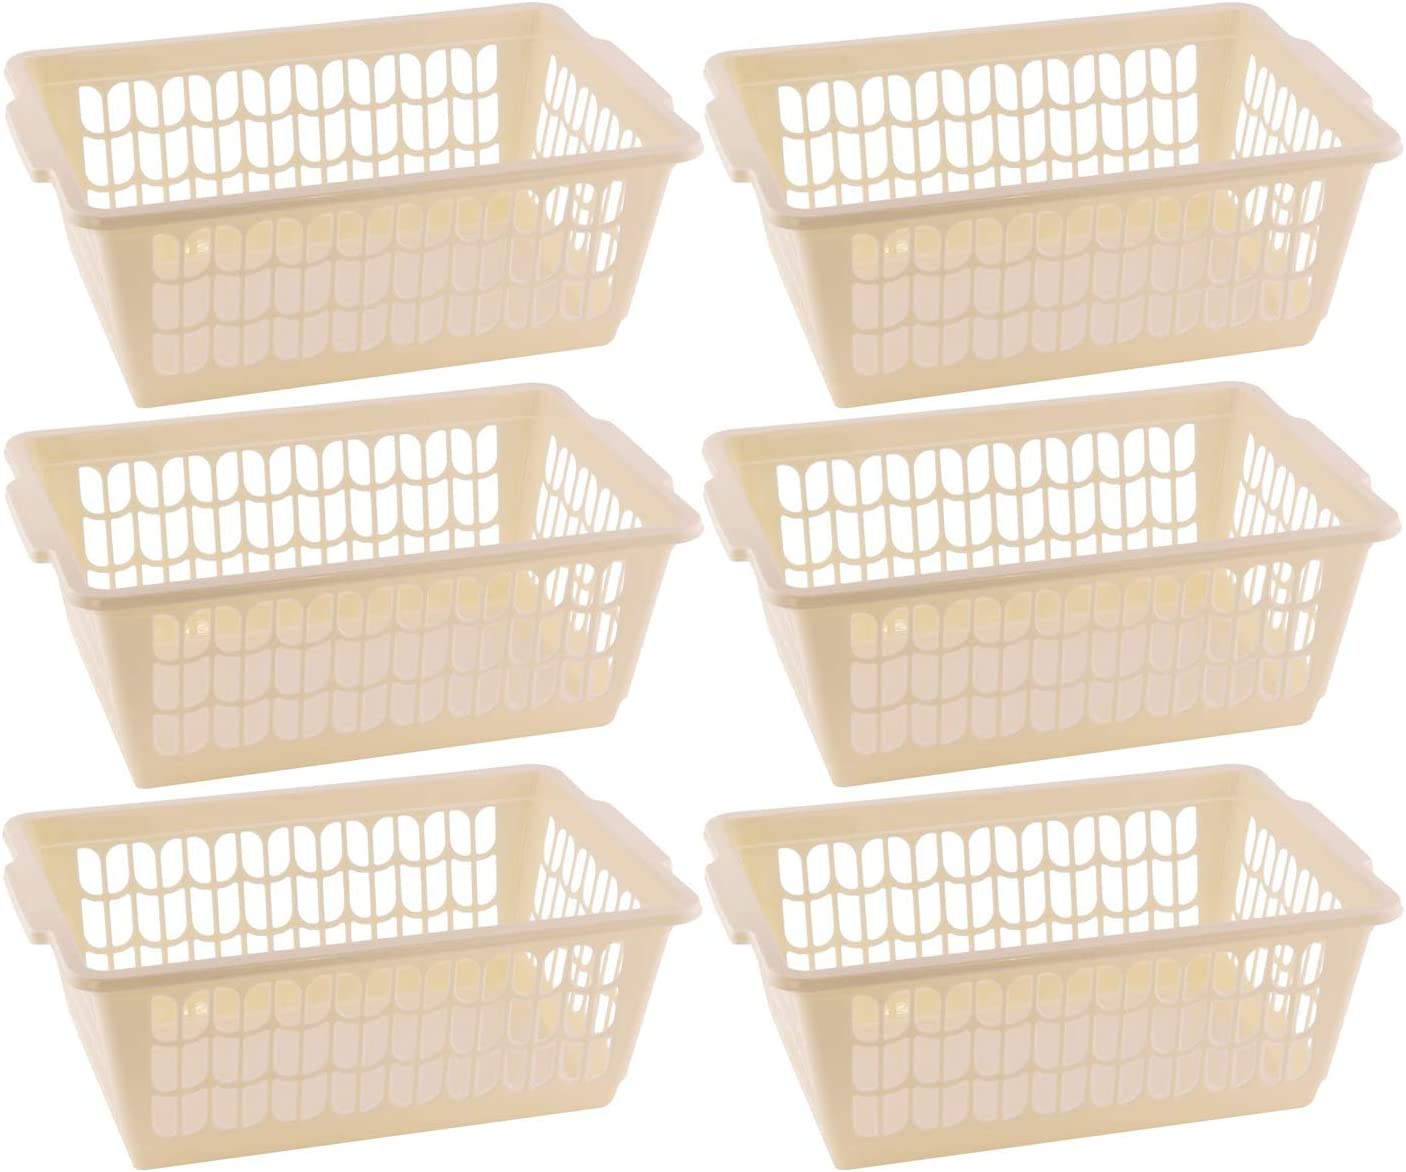 YBM HOME Plastic Perforated Storage Basket Bin Office Drawer, Shelf Desktop Countertop Tray Organizer 32-1188 (6, Beige)